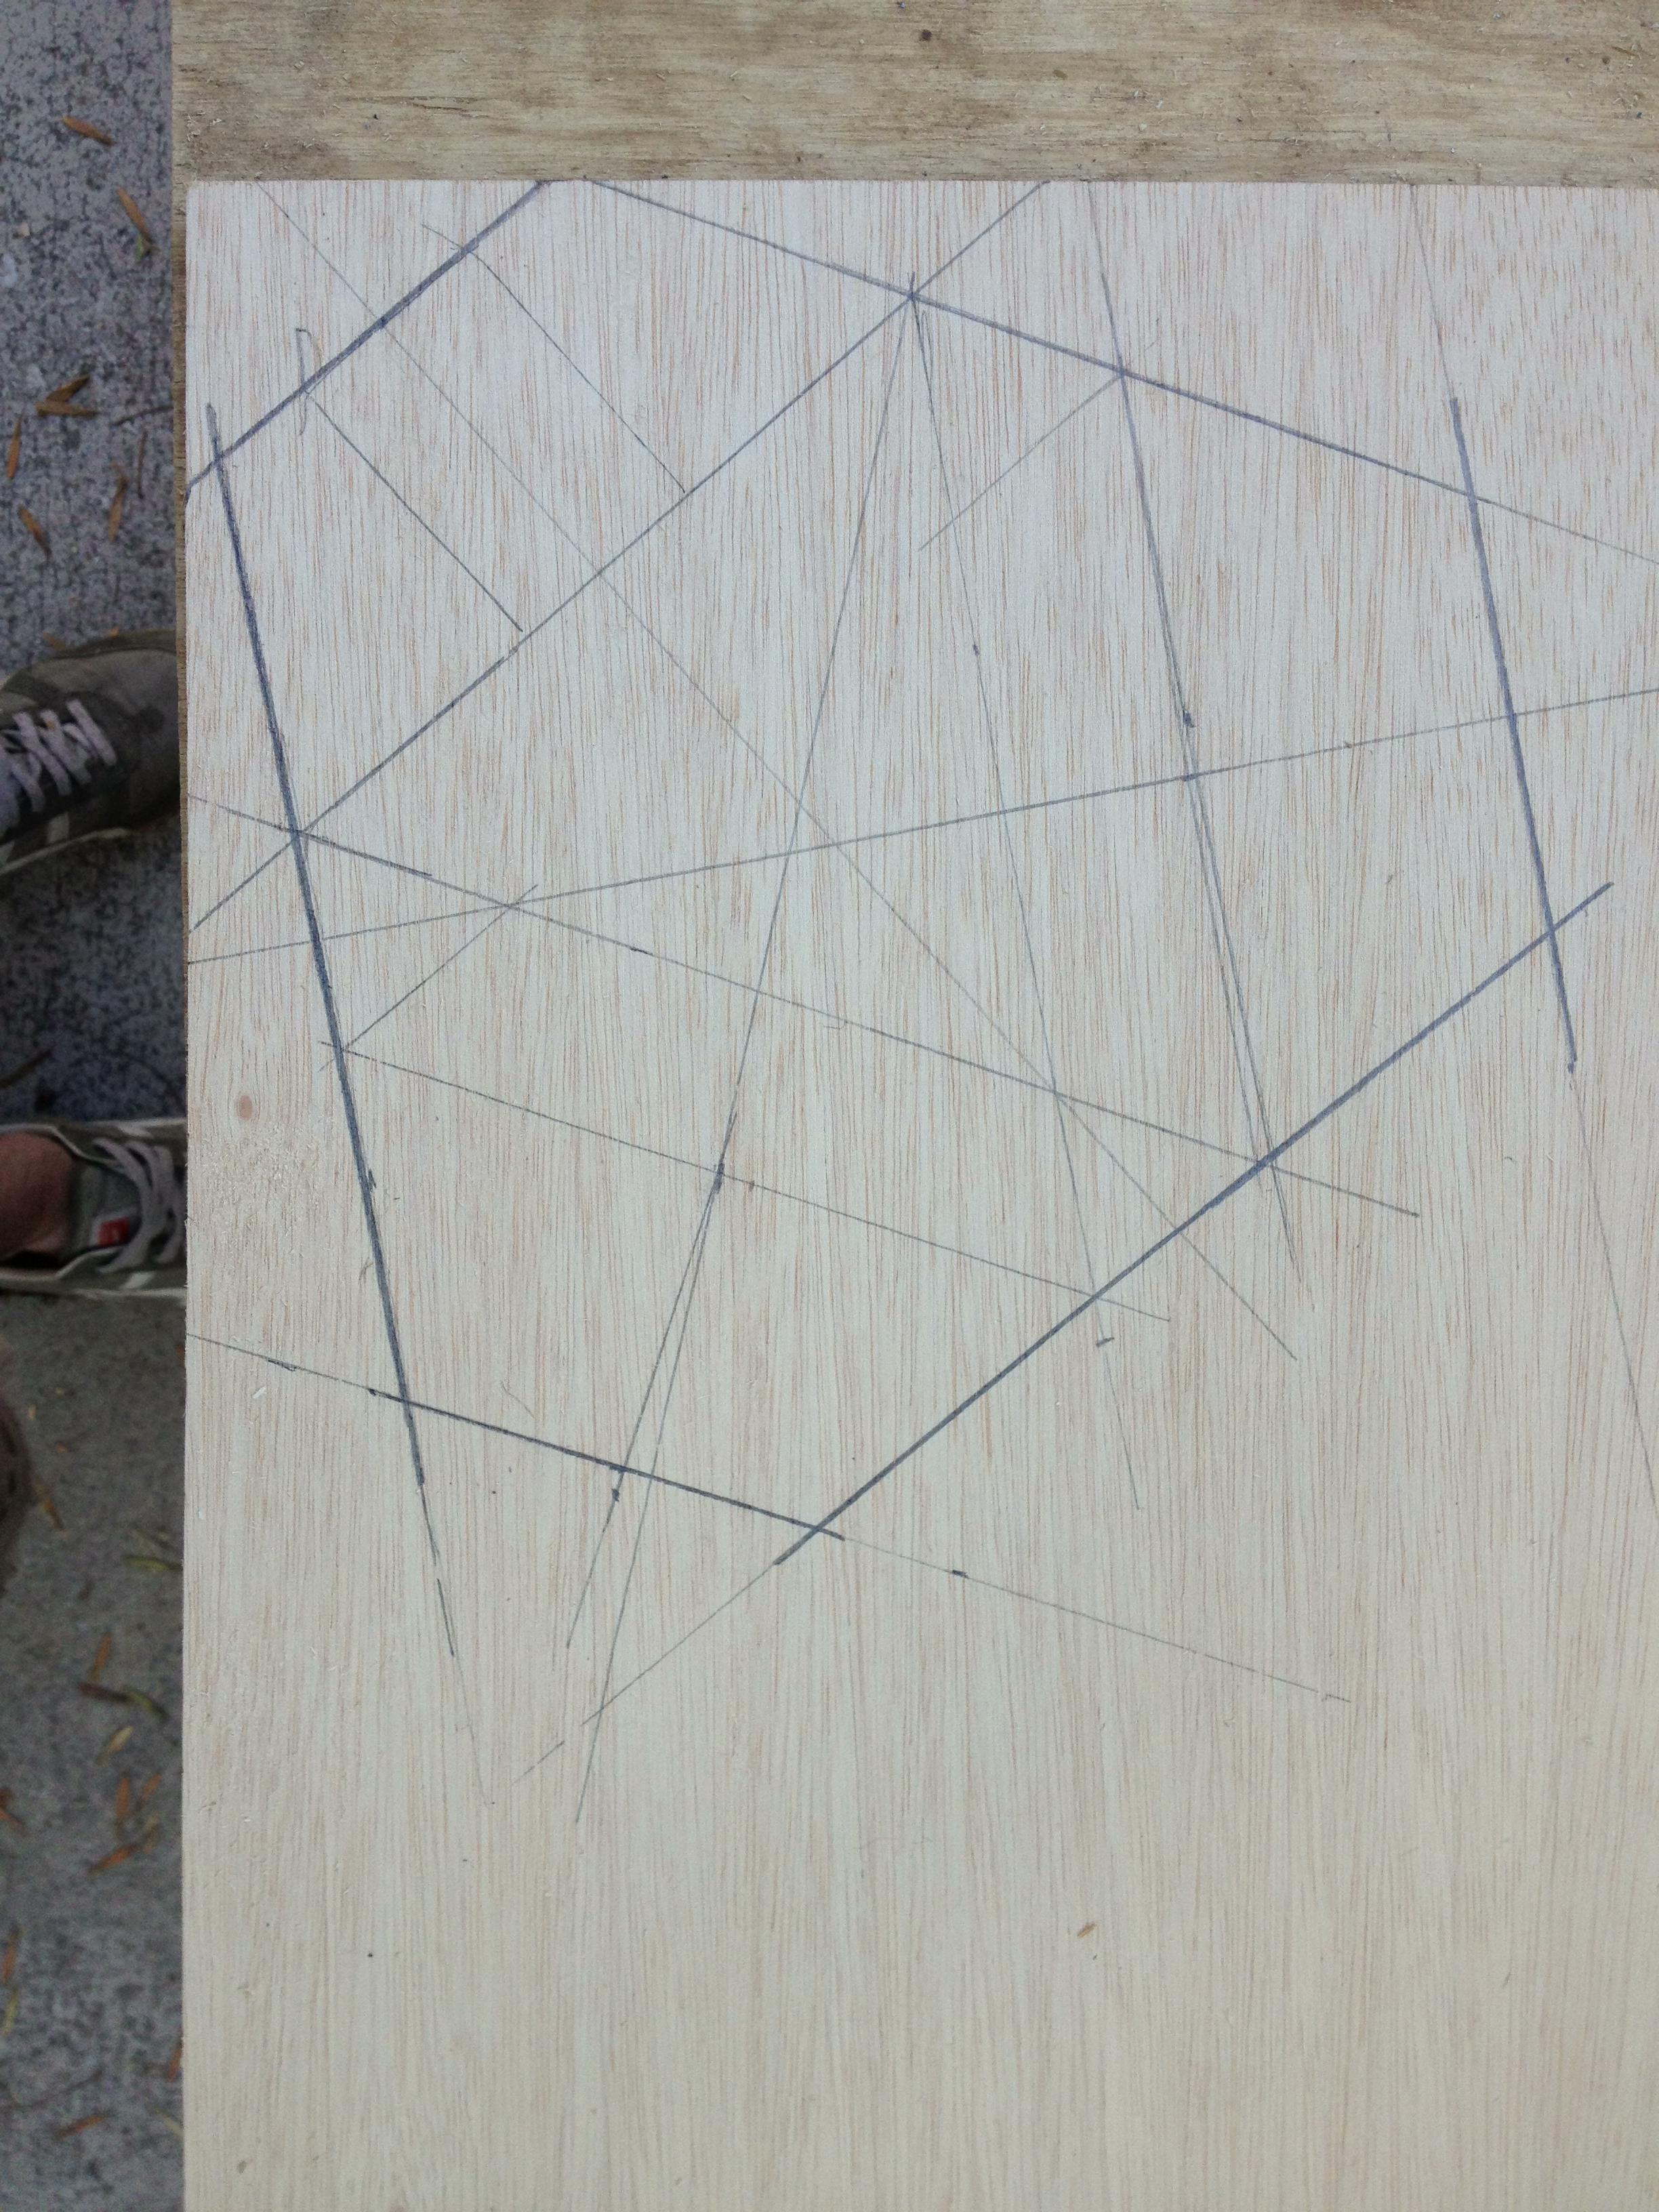 Geometry of top plate.